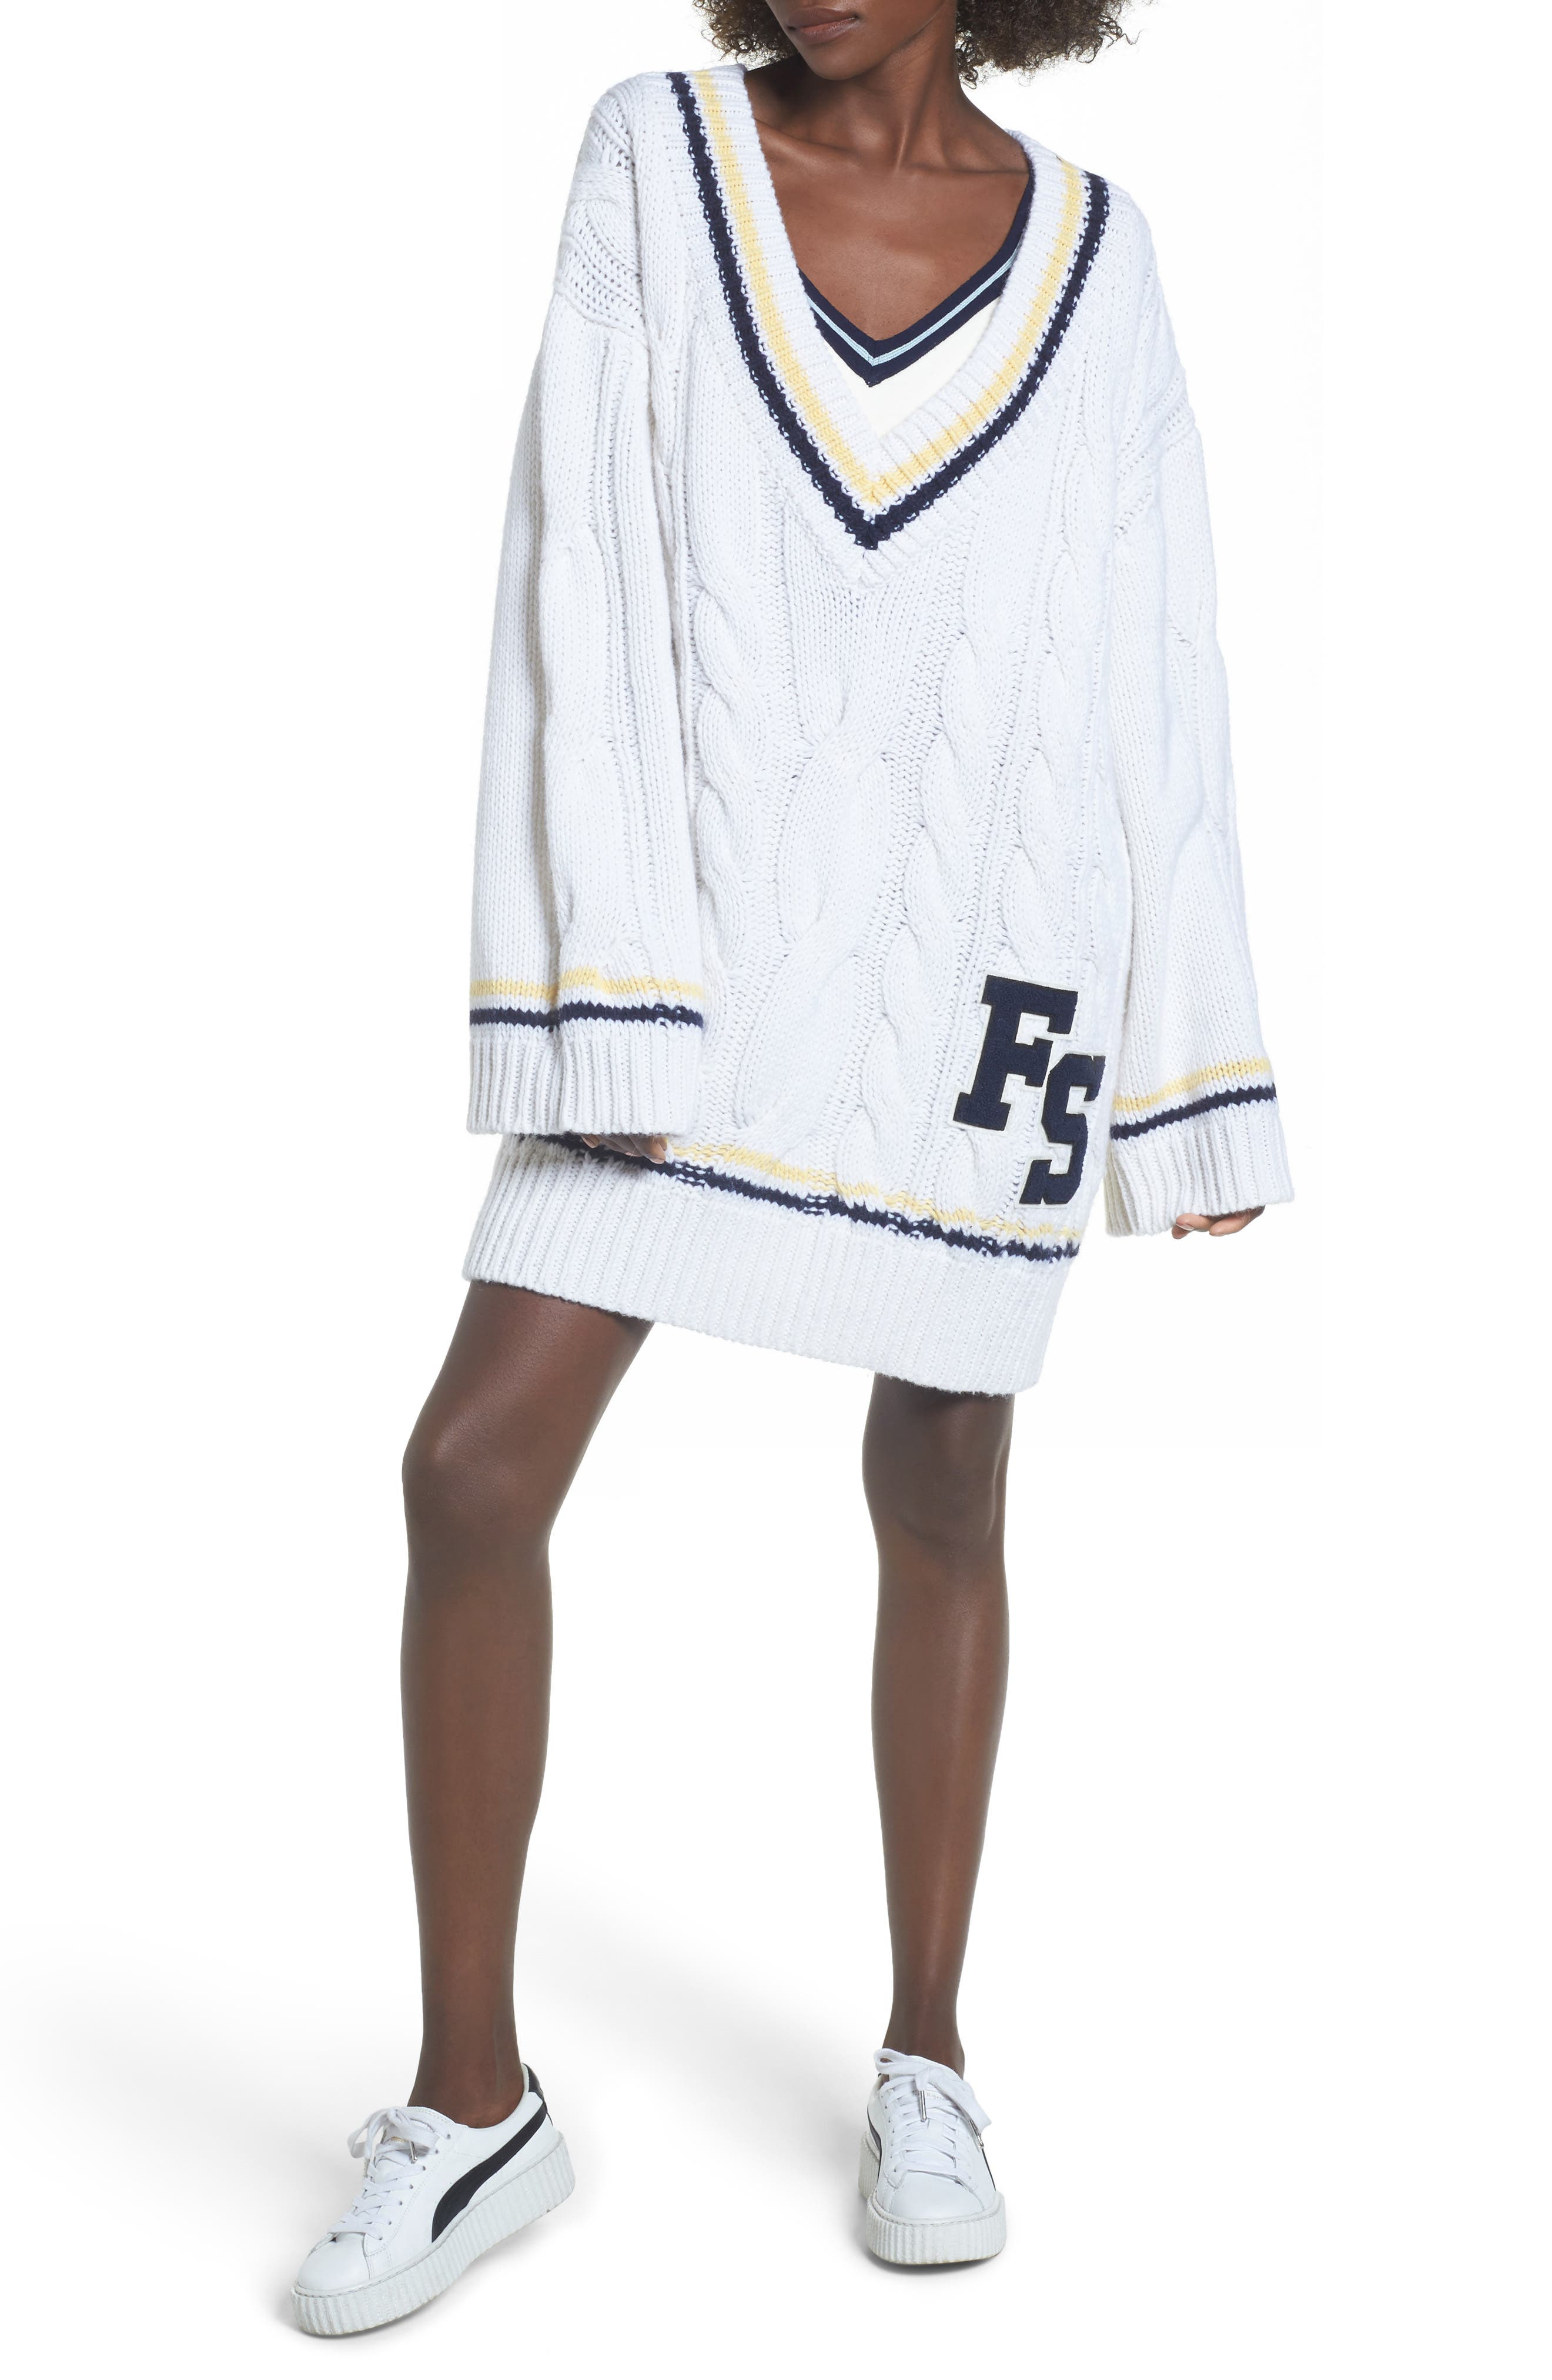 PUMA by Rihanna Longline Cable Knit Sweater,                             Main thumbnail 1, color,                             100